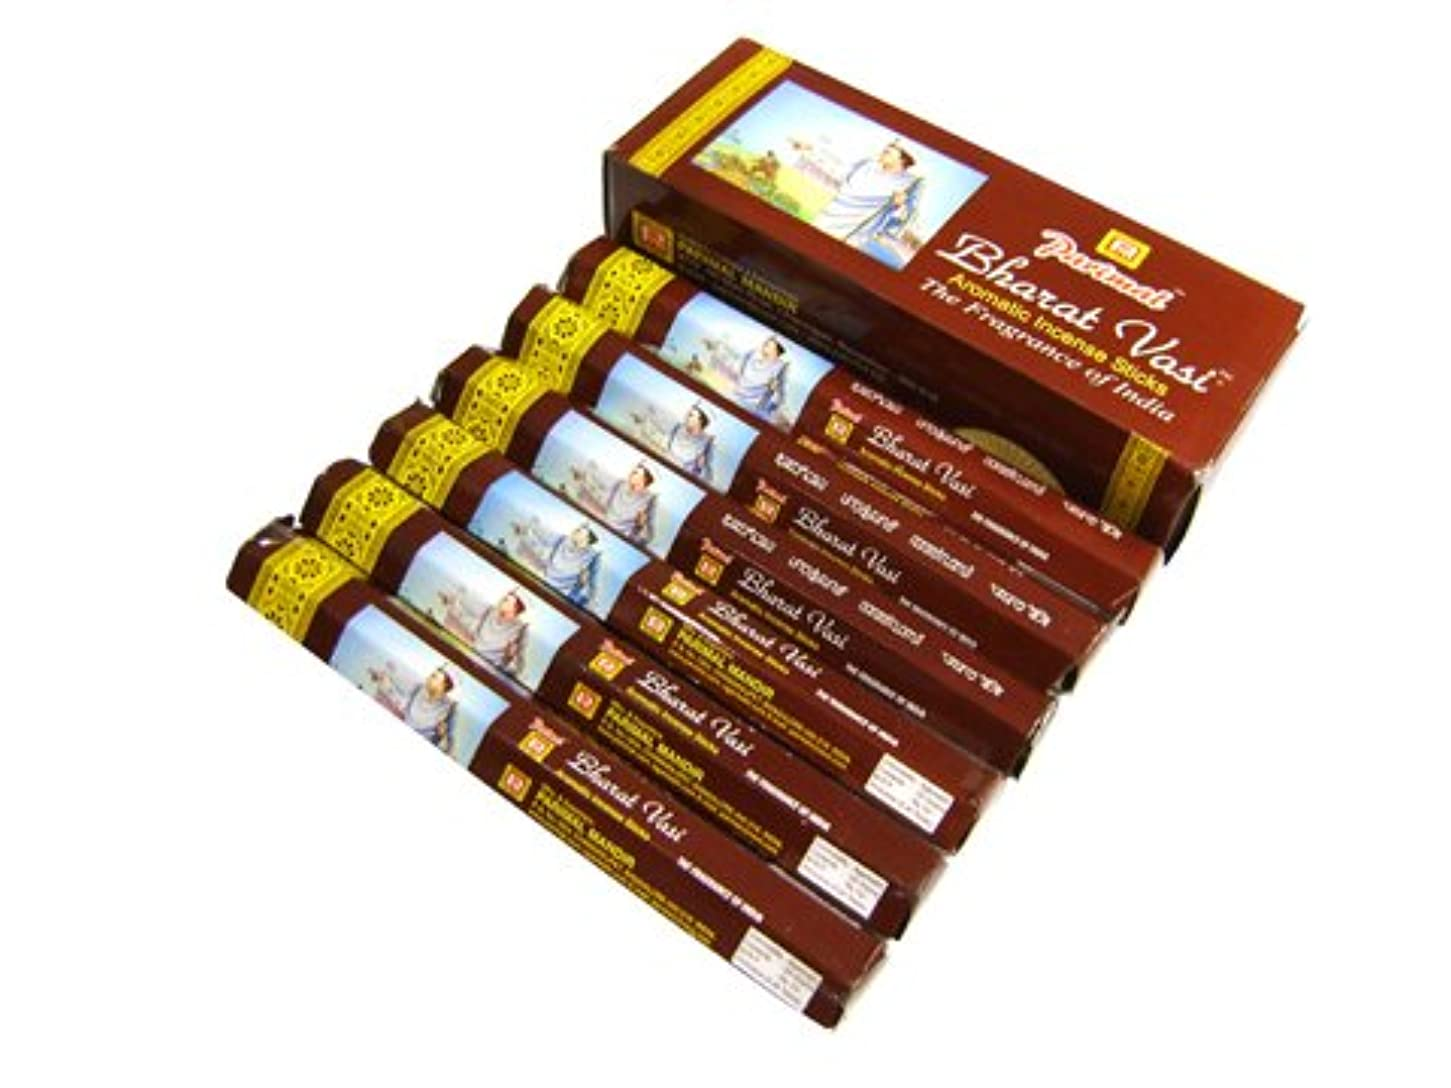 PARIMAL(パリマル) バラバシ香 スティック BHARAT VASI 6箱セット